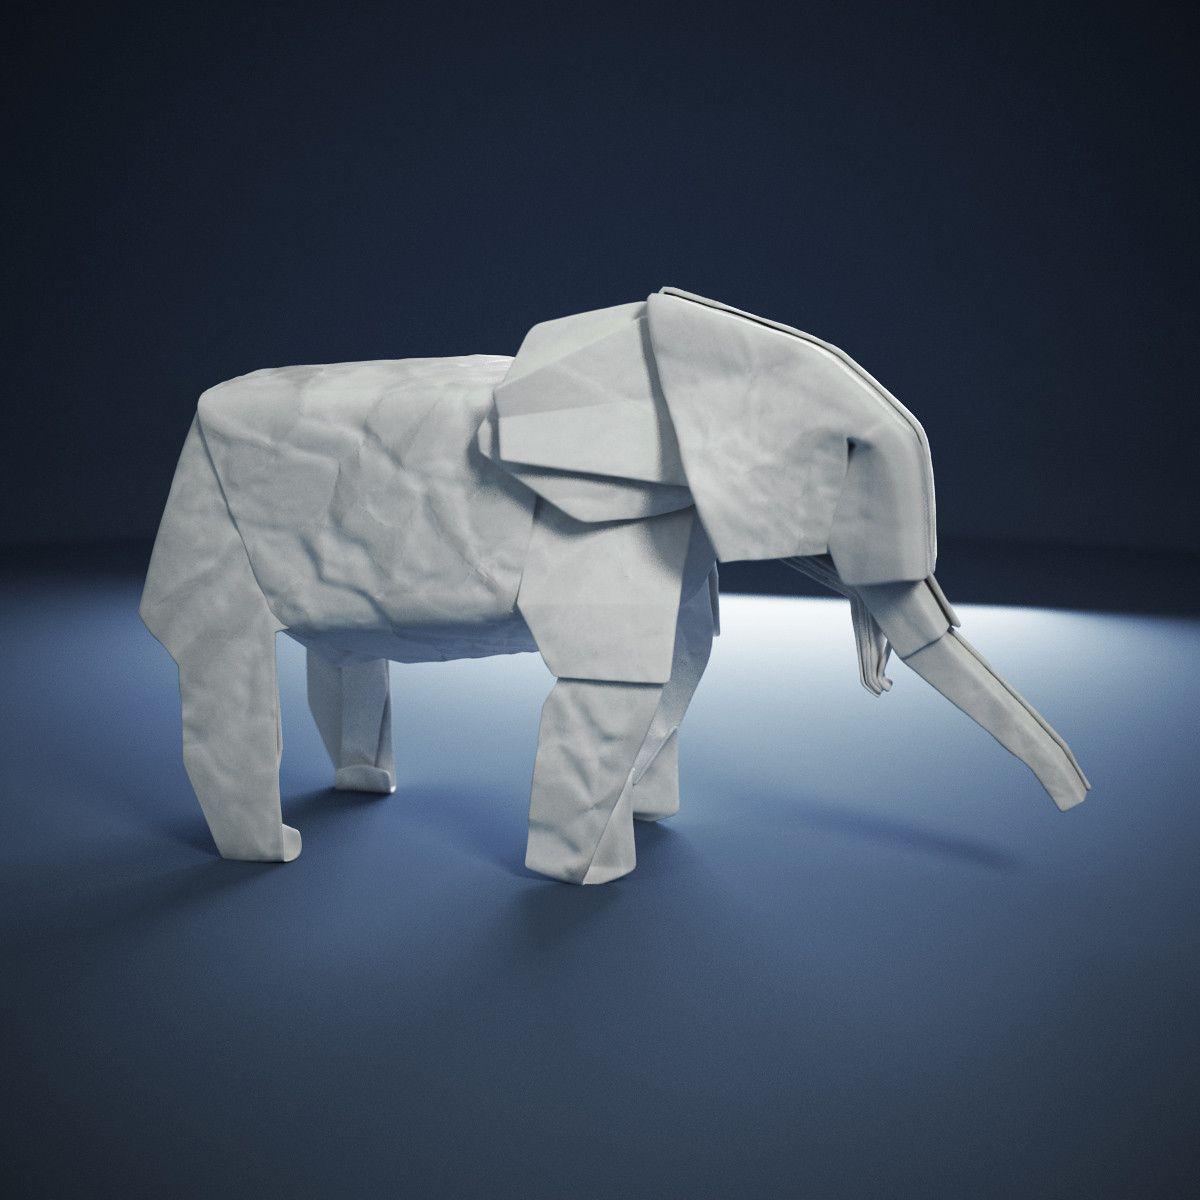 3d origami elephant 3d model 3d modeling pinterest origami 3d origami elephant 3d model jeuxipadfo Choice Image